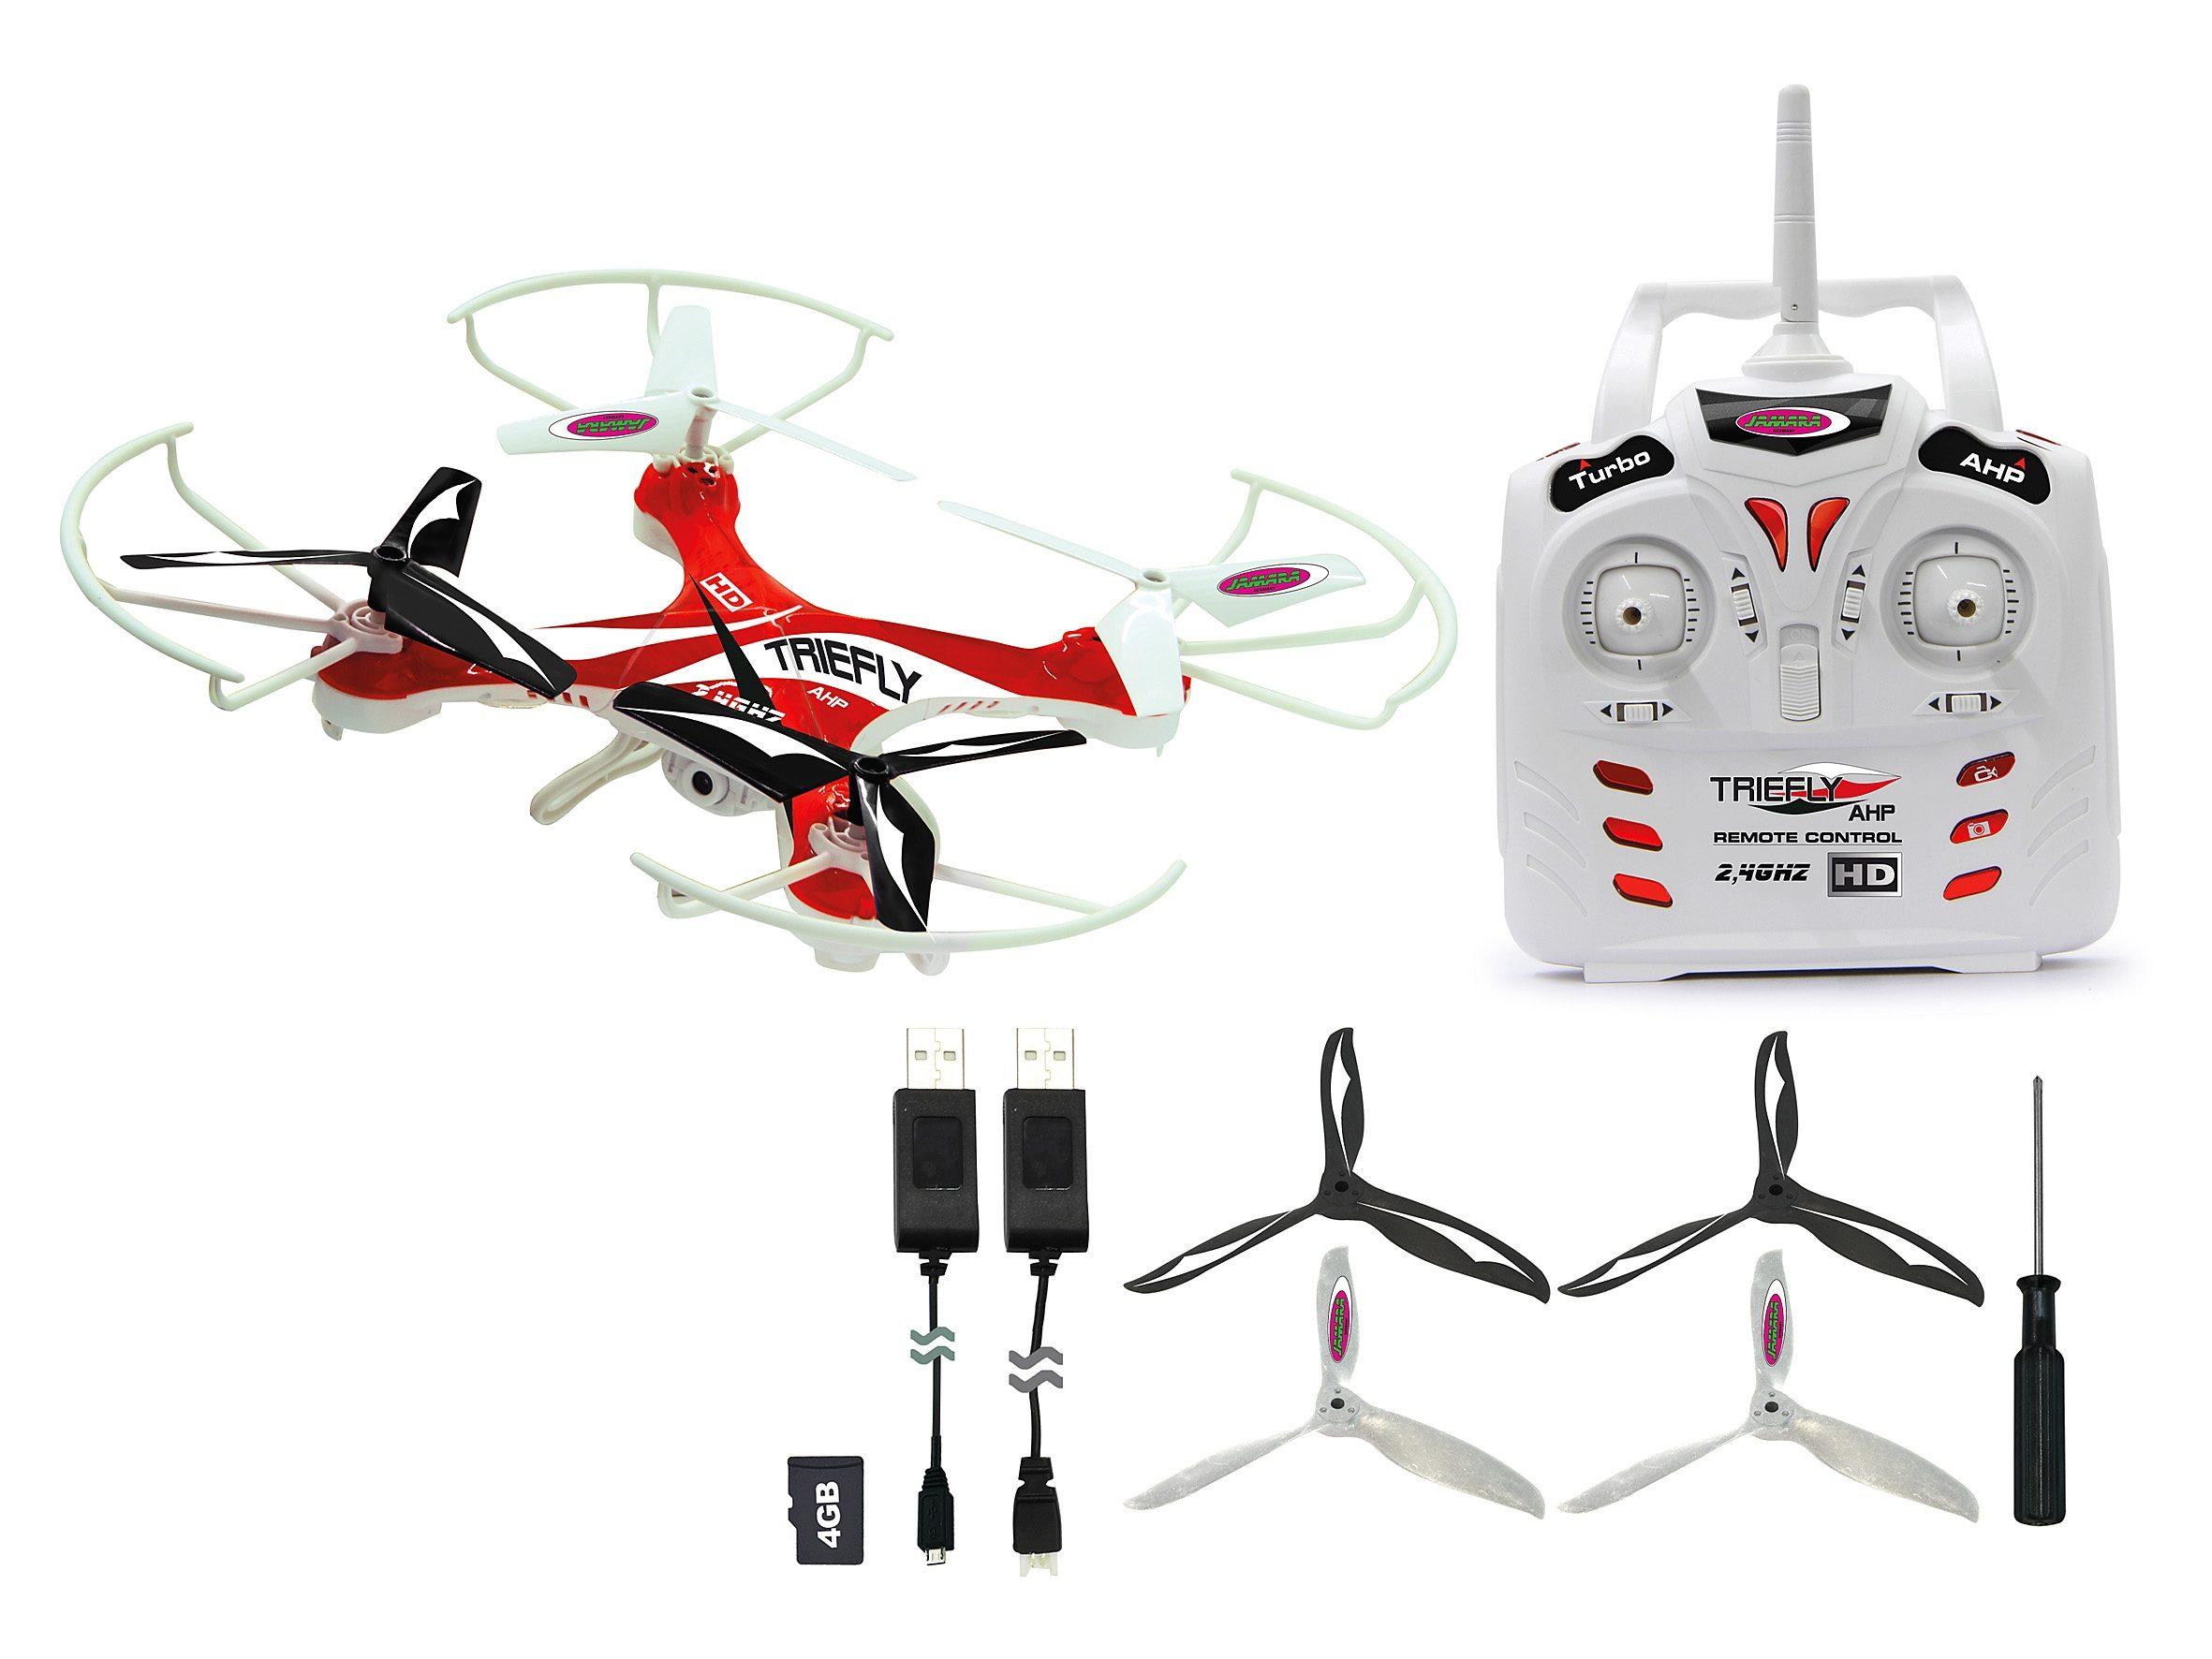 JAMARA Quadrocopter mit Kamera, 2,4 GHz, »Triefly«